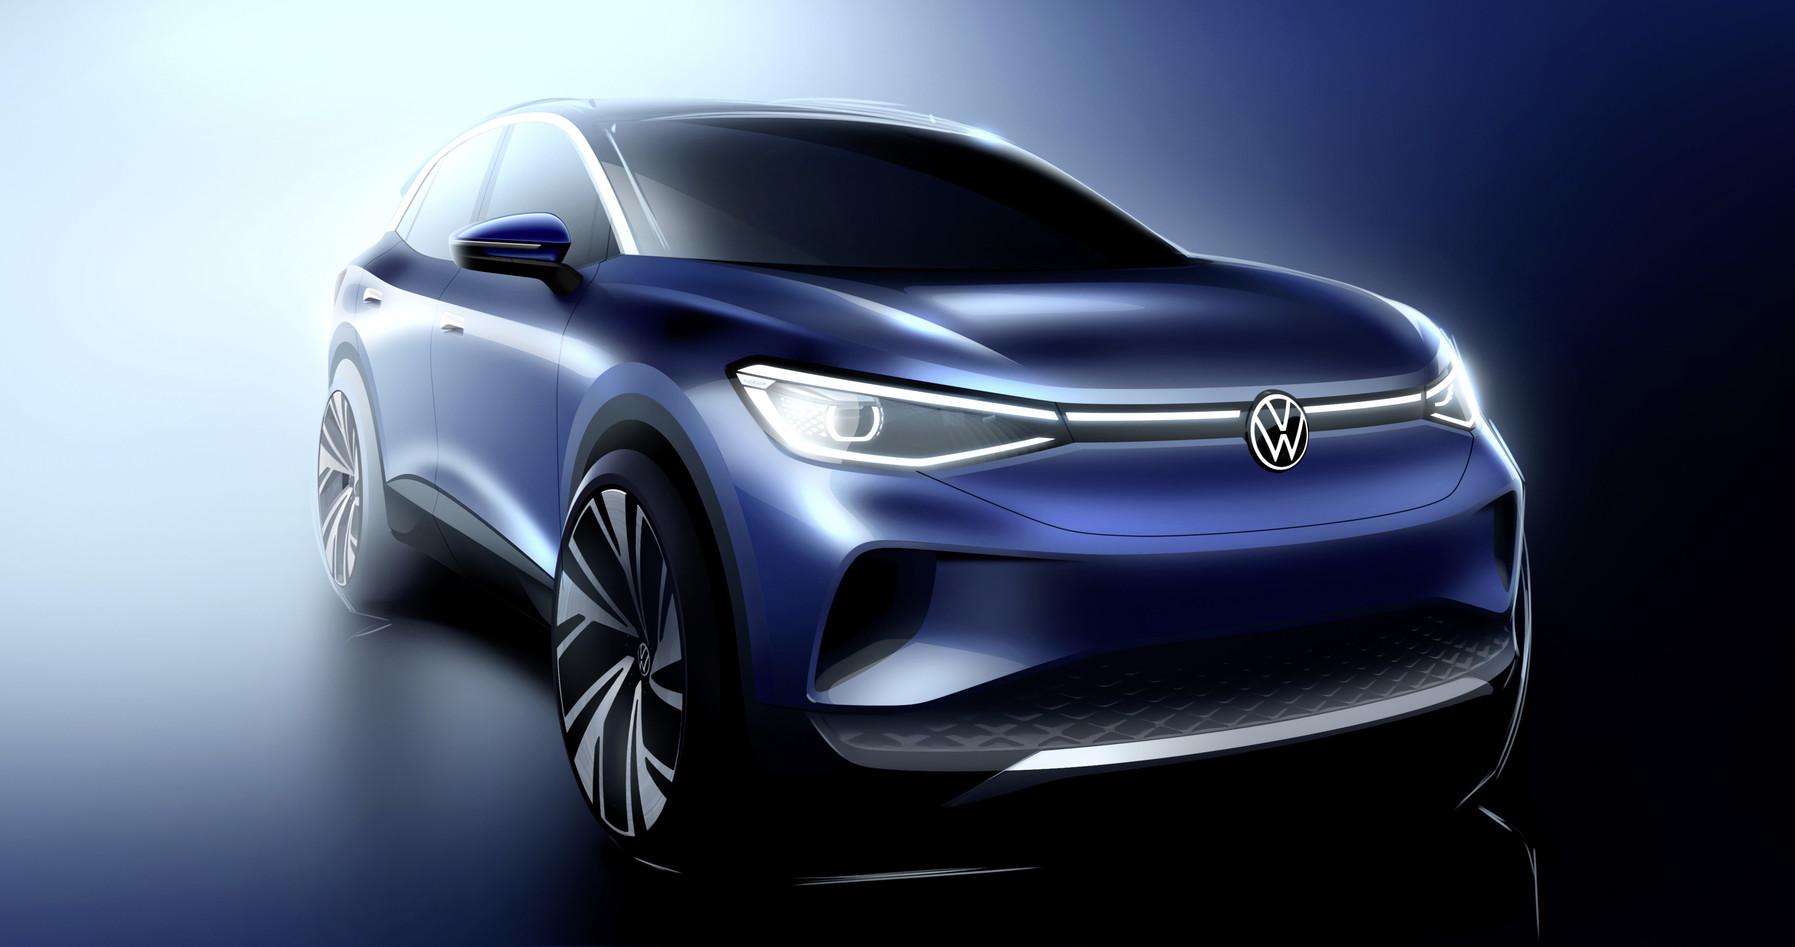 Noi imagini cu ID.4, primul SUV full electric Volkswagen